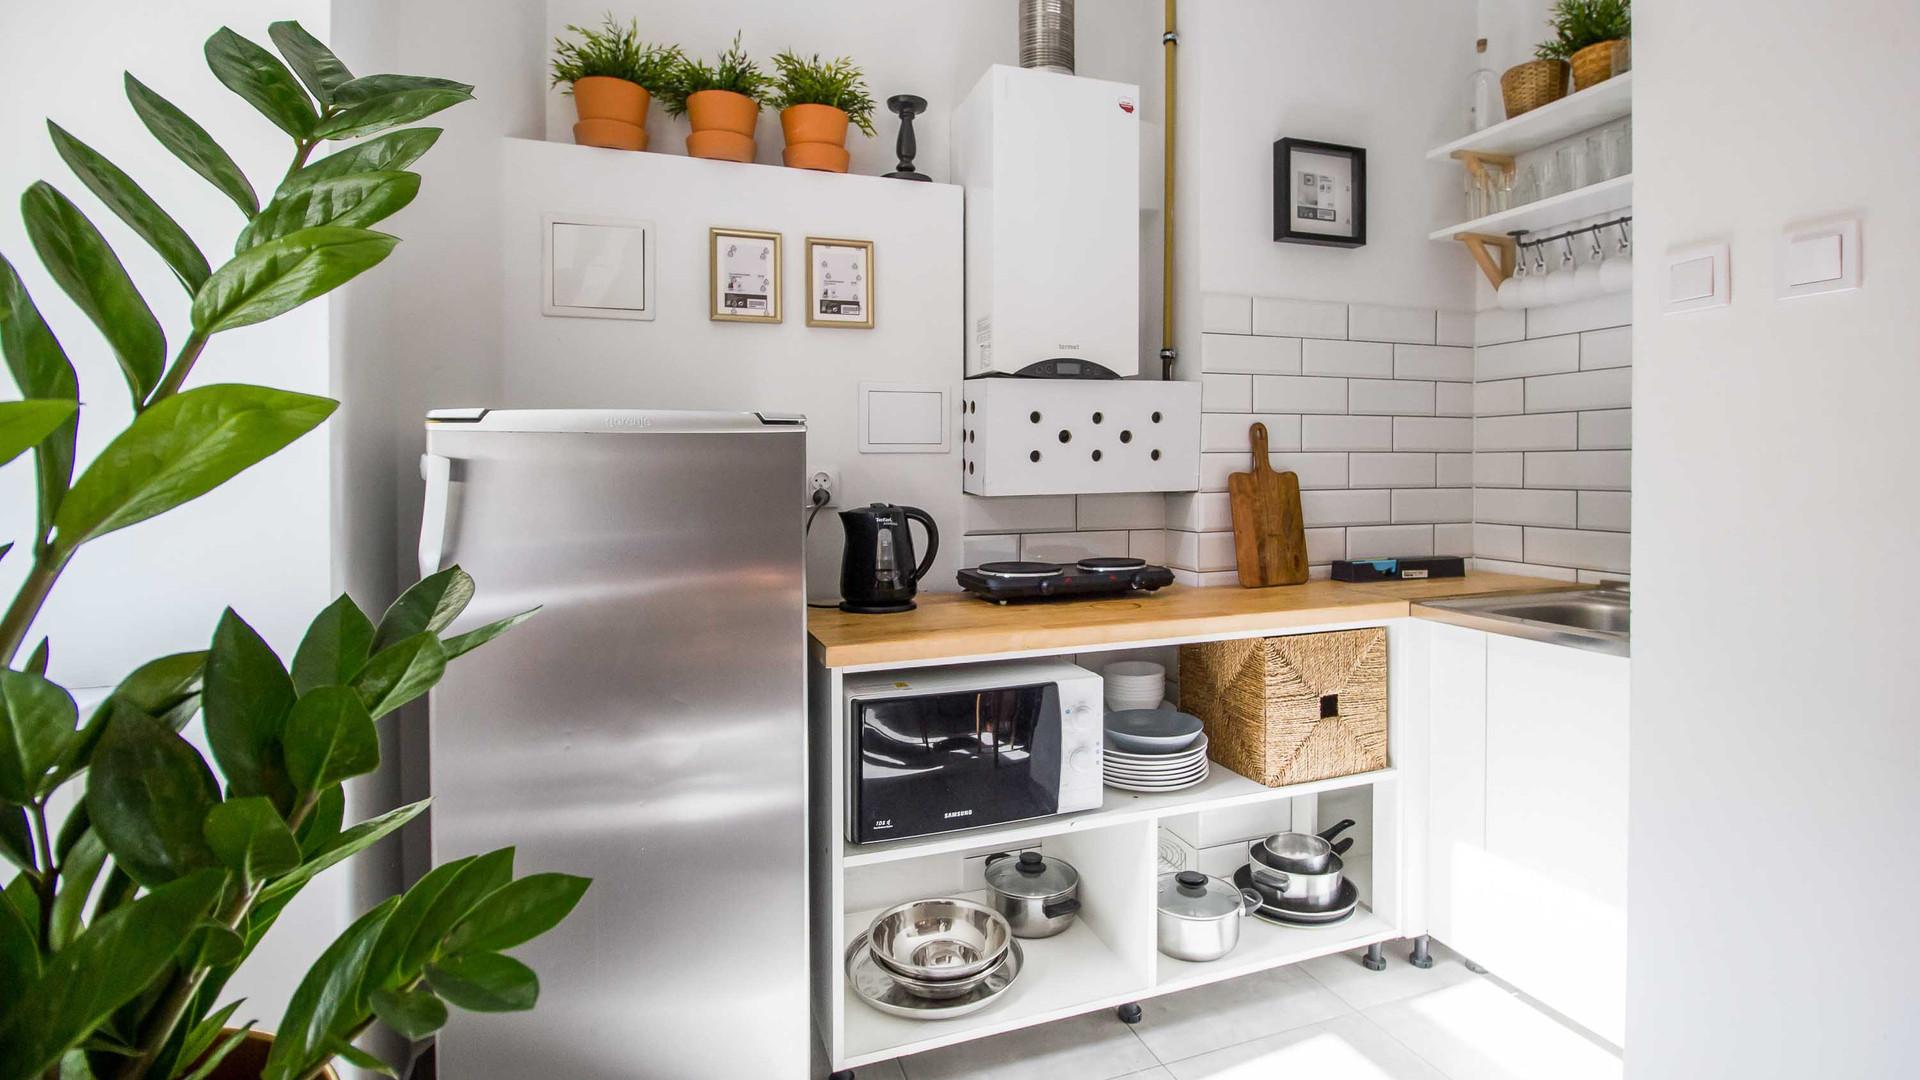 Apartment for short rent Poznan Poland (